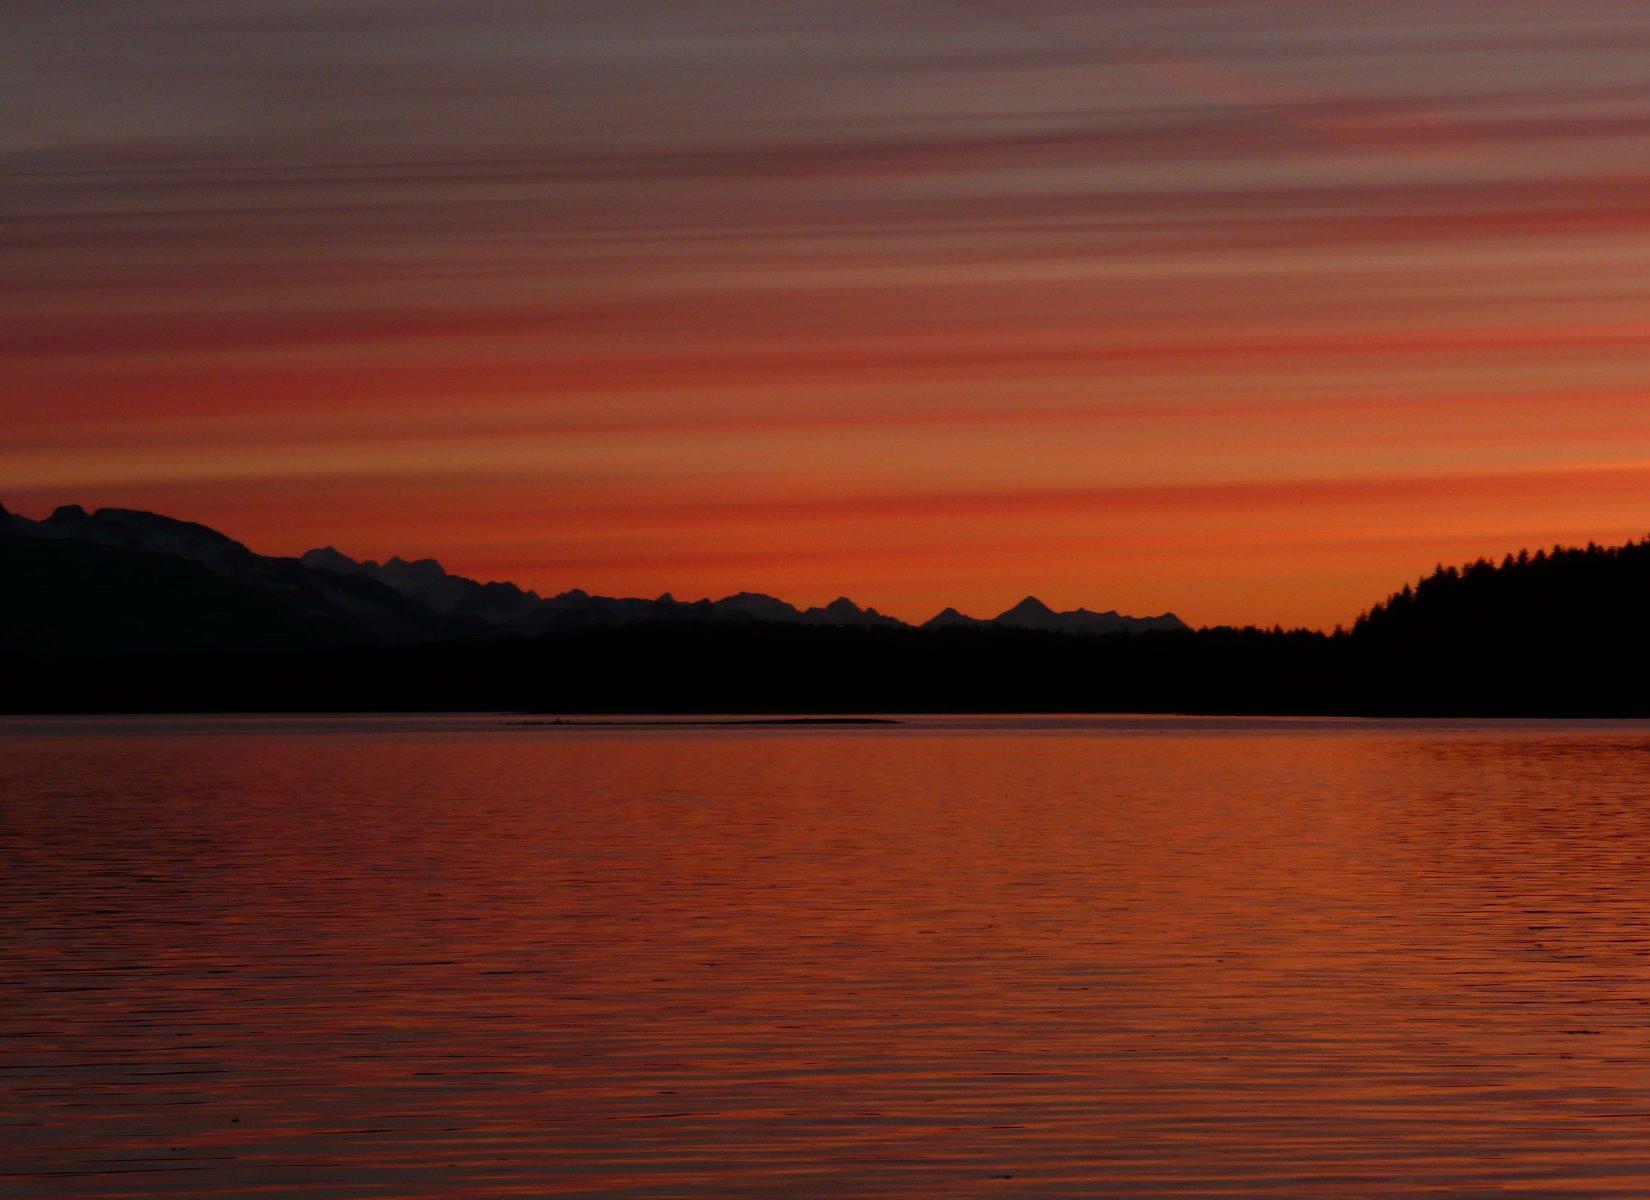 Sunset over the Beardslee Islands.